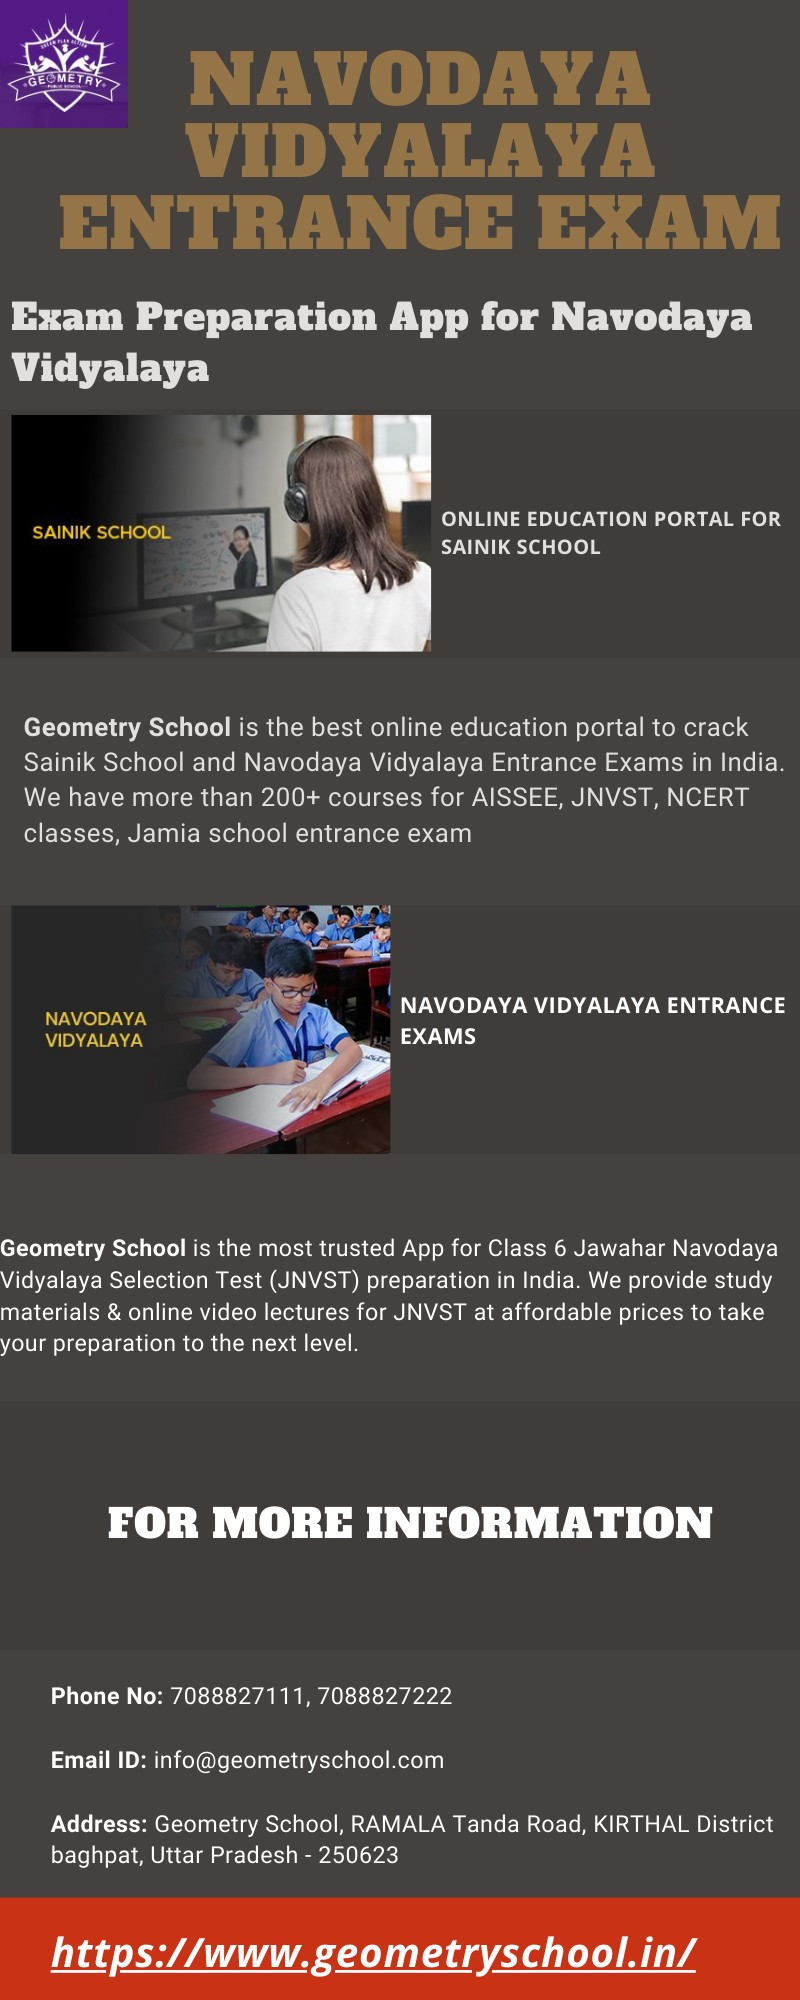 Top Exam Preparation App for Navodaya Vidyalaya